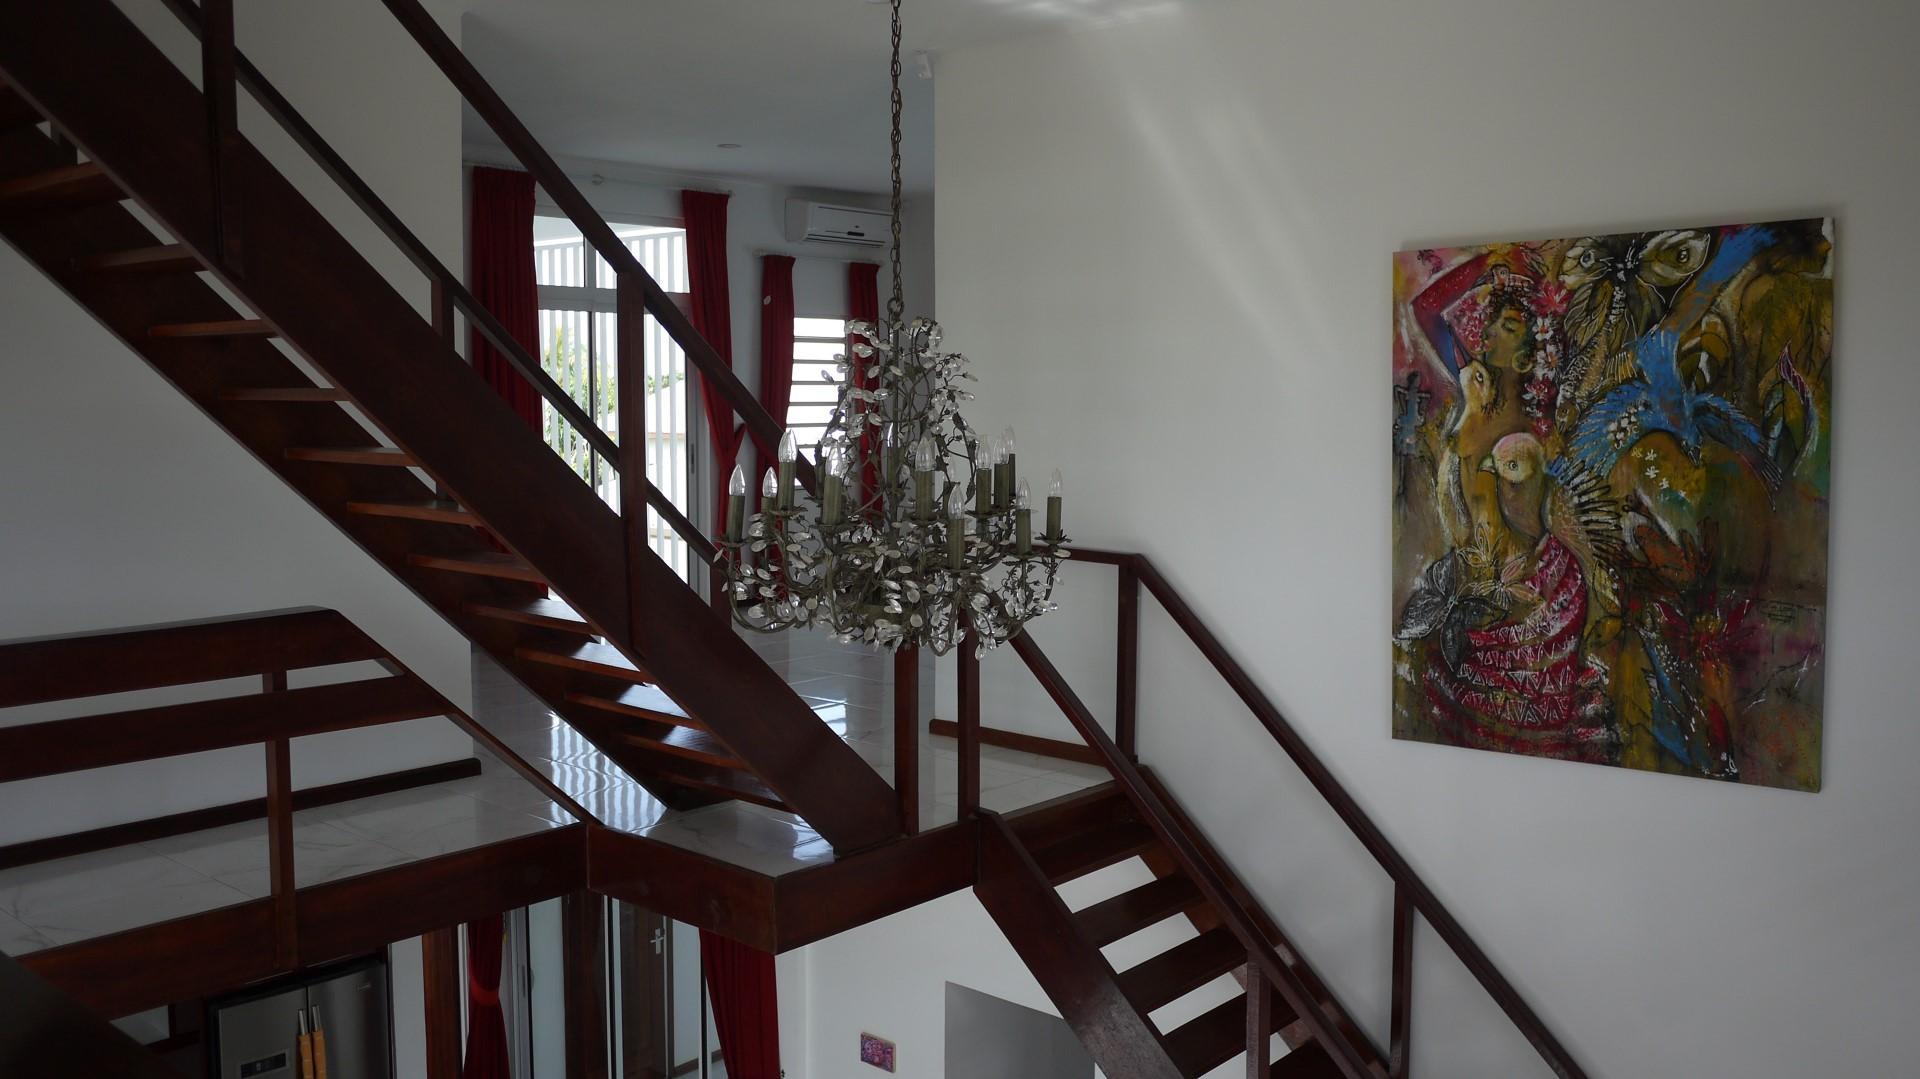 Gansistraat-Morgenstond-Paramaribo-Suriname-Terzol-Vastgoed-s15